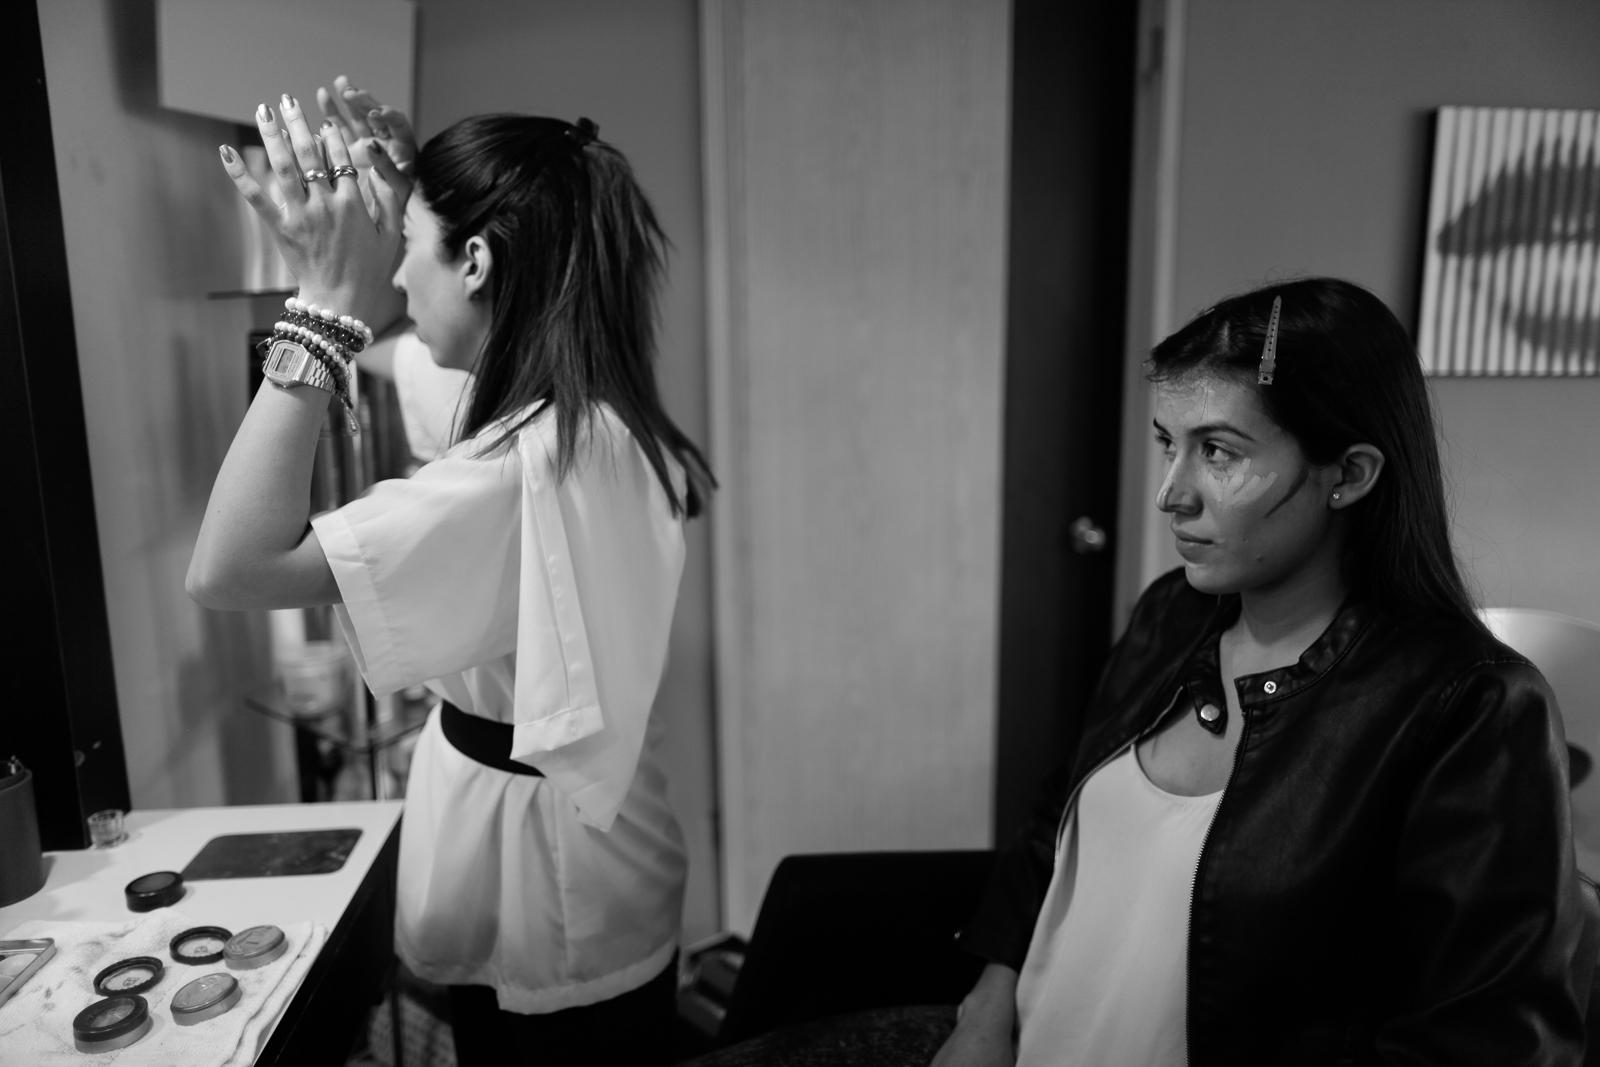 Lore, de Studio 84, echándole ganas al maquillaje de Ana.  Lore,from Studio 84, working hard on Ana's makeup